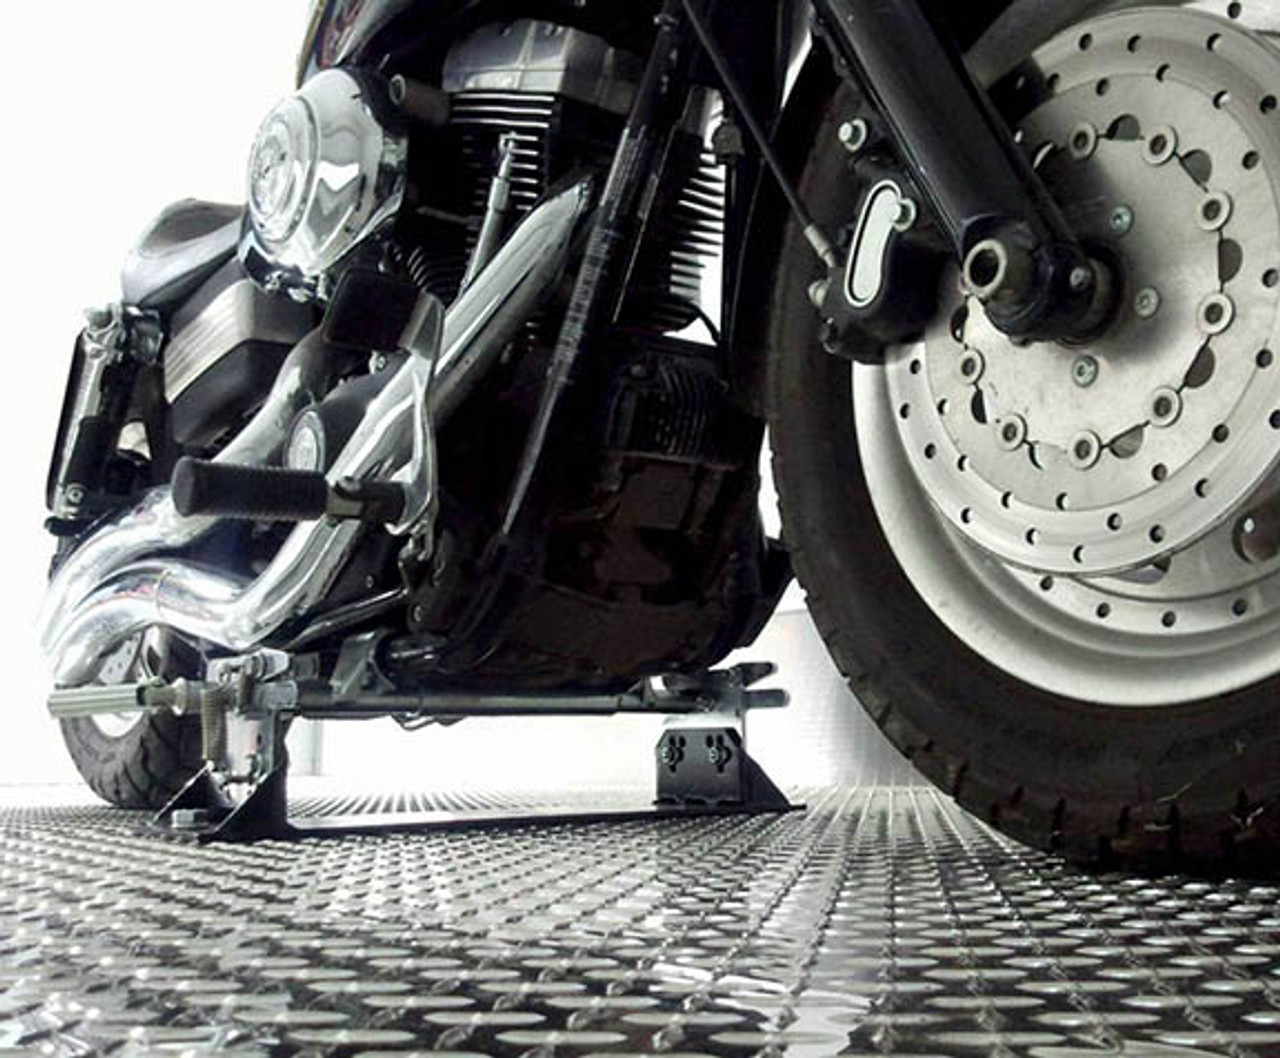 MC2302 --- Biker Bar for Harley Davidson Softail, Dyna, V-Rod Bikes